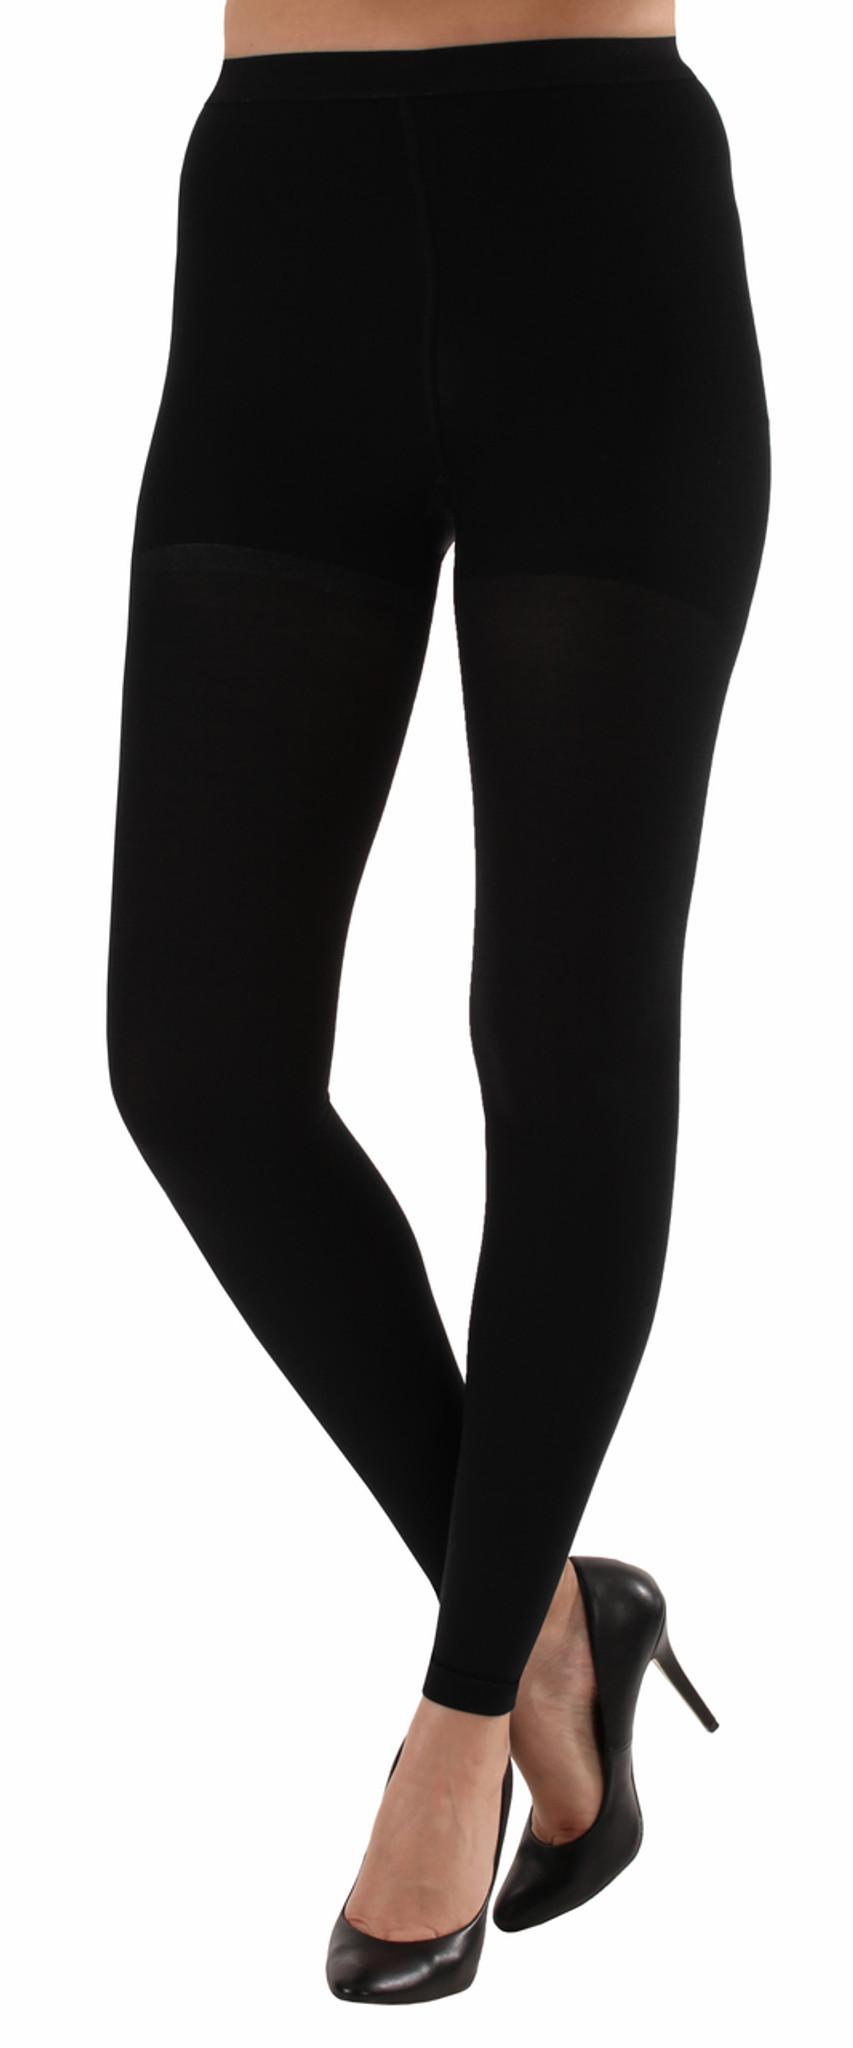 compression leggings varicose veins